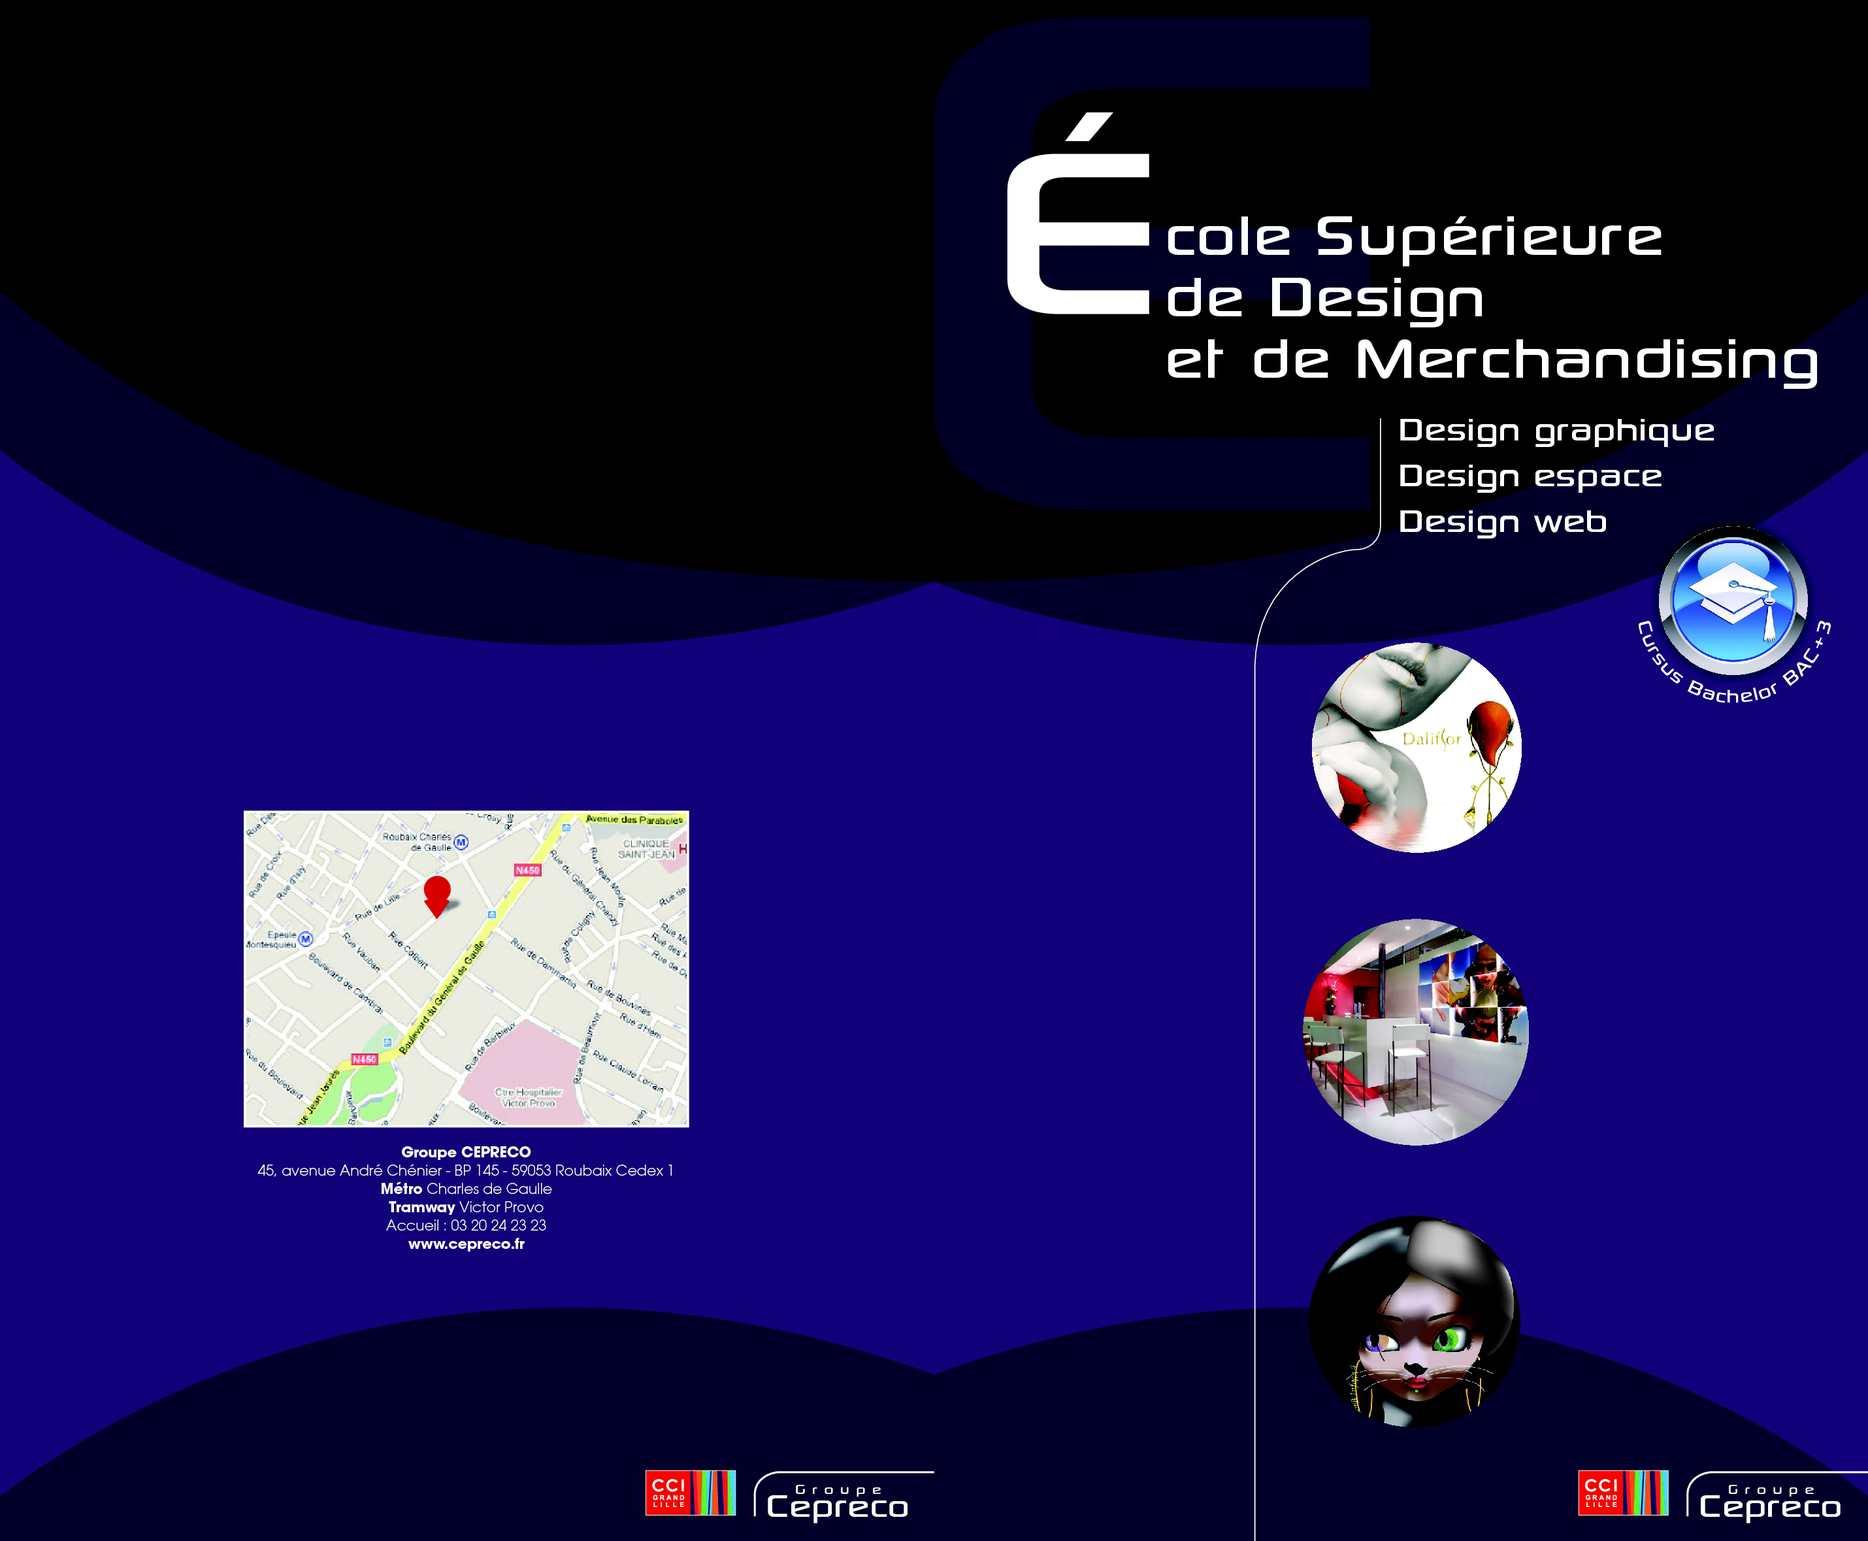 calam o ecole superieure de design merchandising. Black Bedroom Furniture Sets. Home Design Ideas